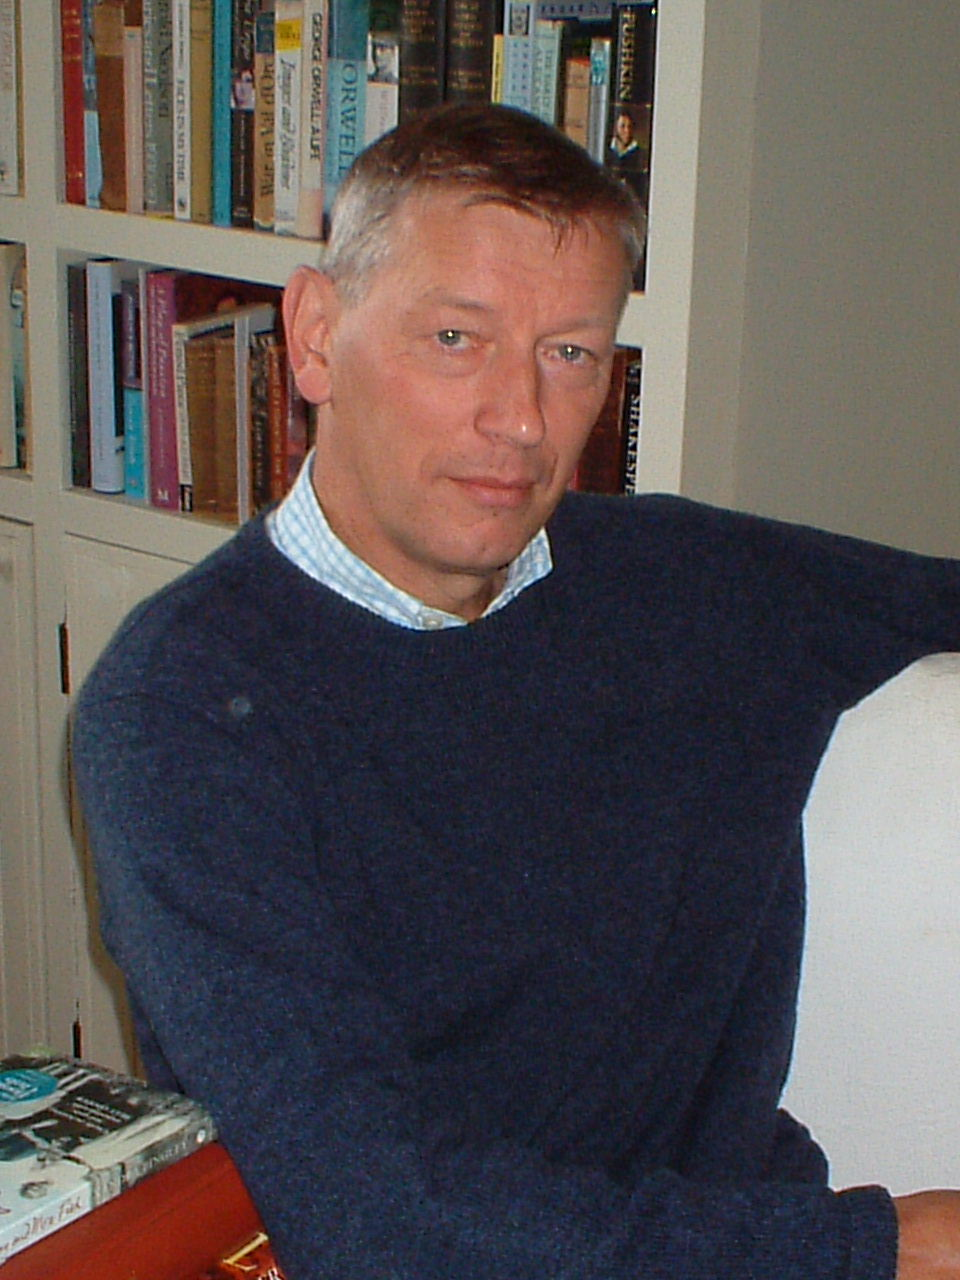 Photo of Alan Judd